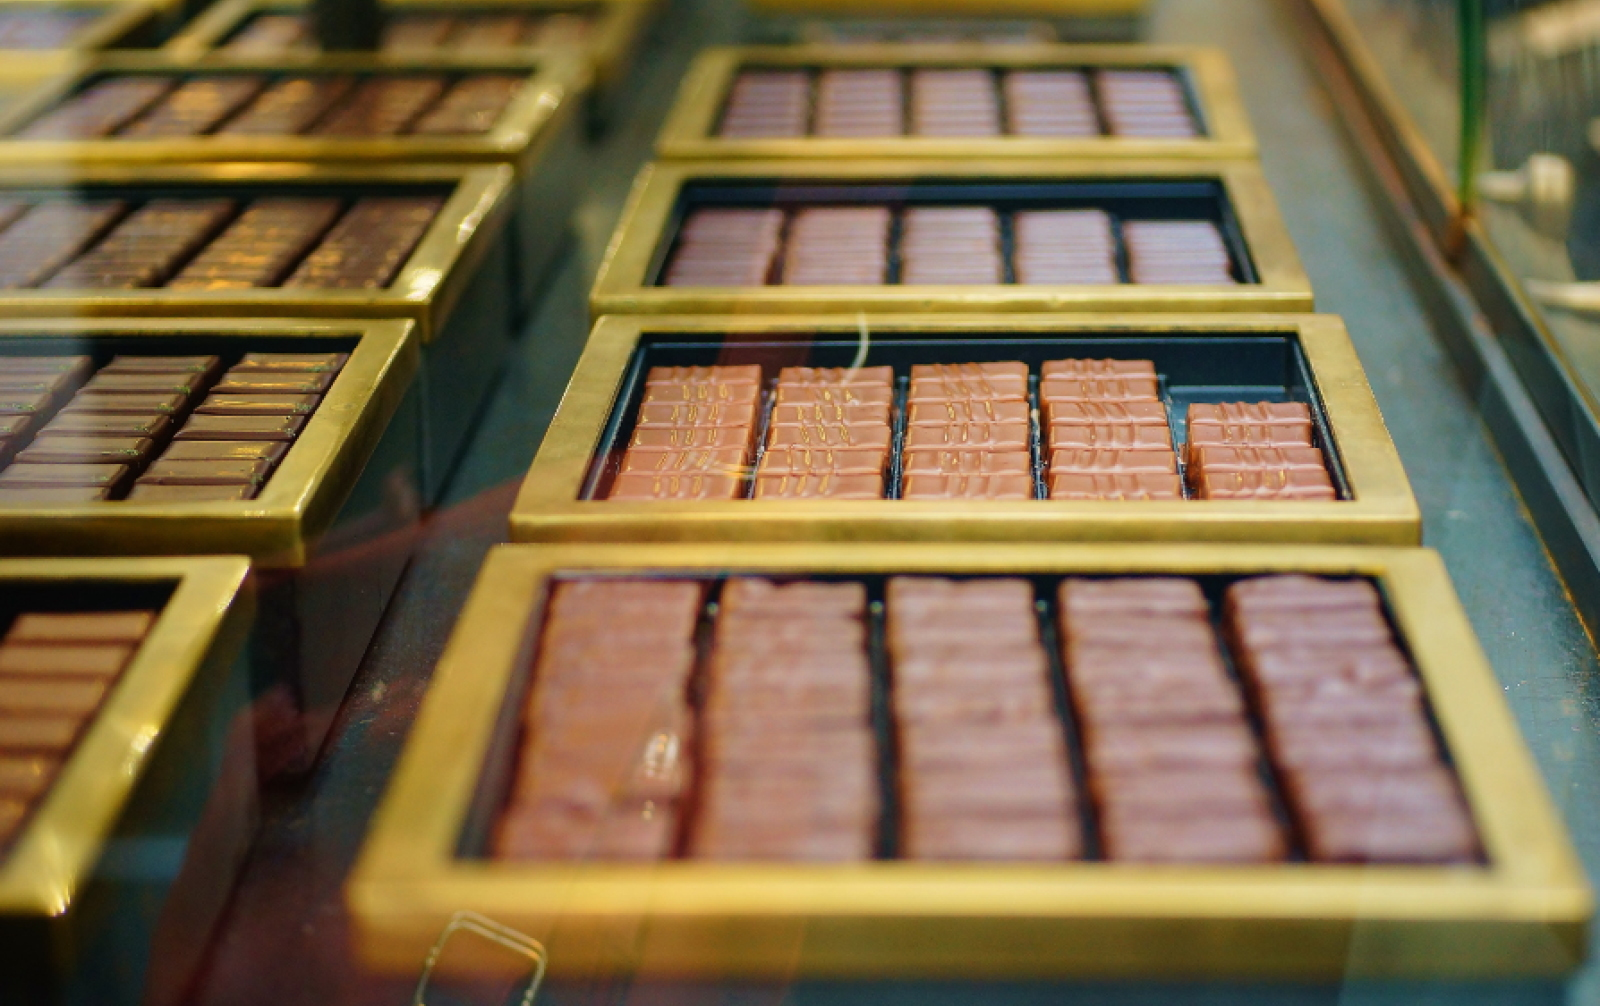 Le Chocolat Alain Ducasse ボンボンショコラ